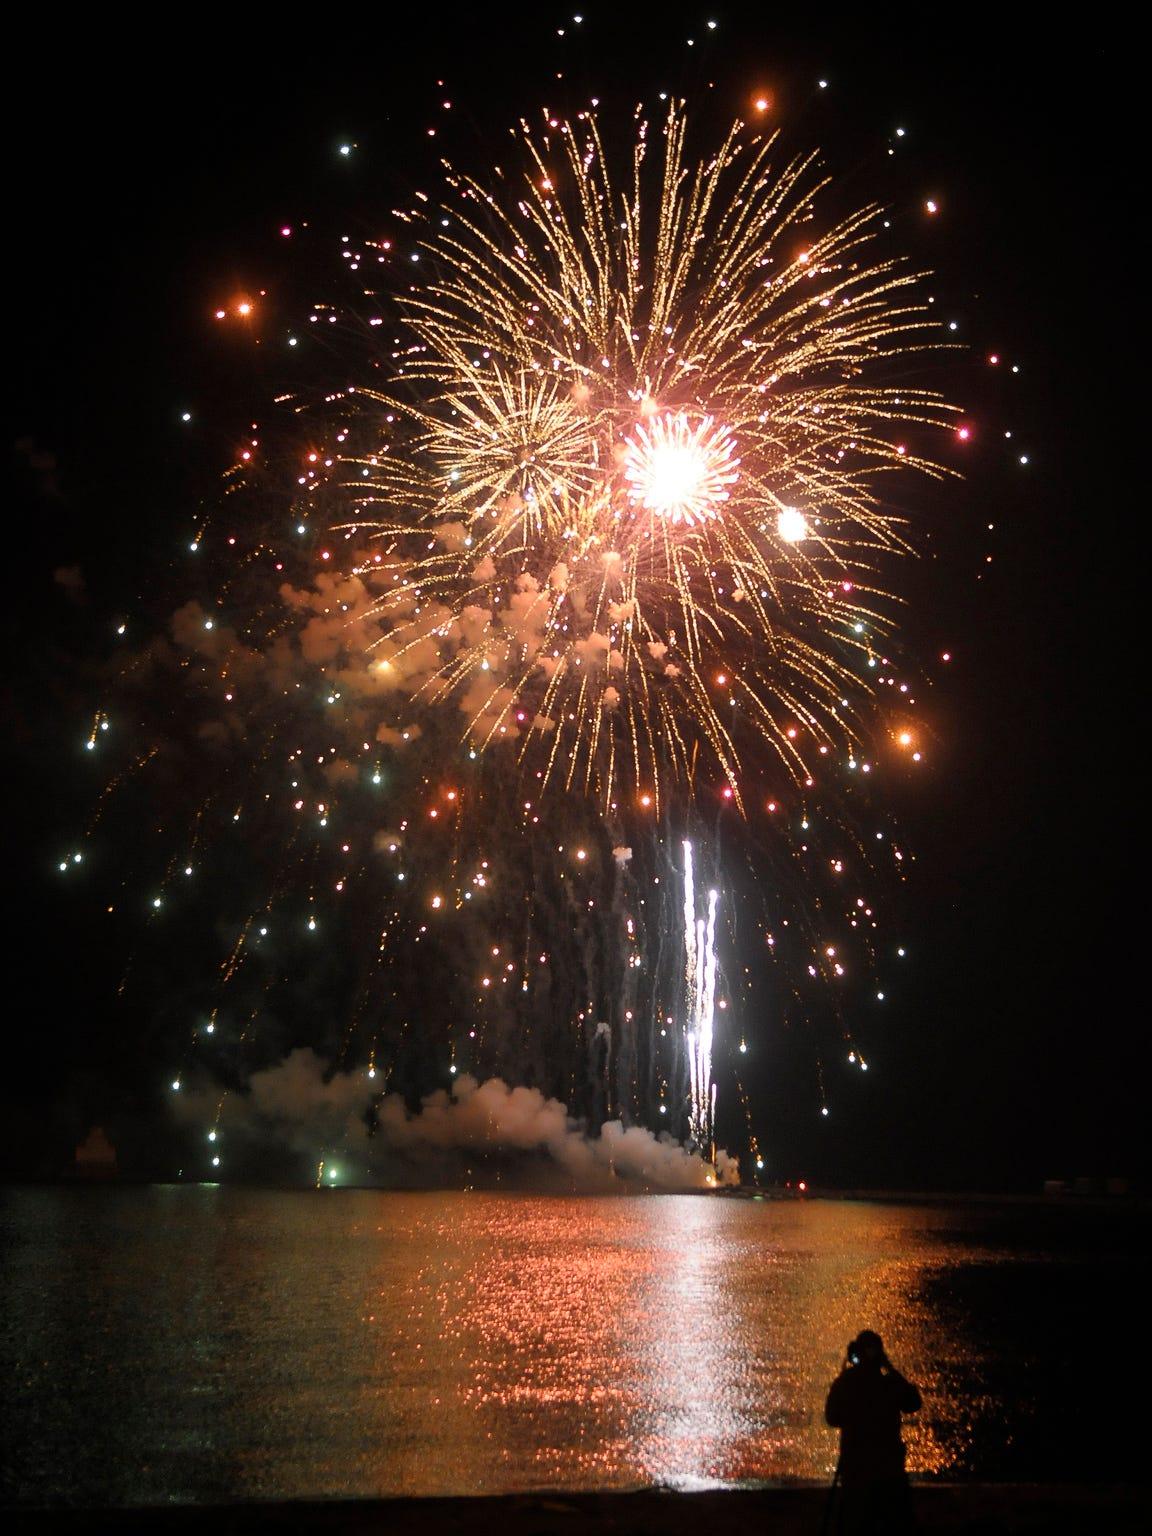 Fourth of July fireworks near the Lake Michigan shoreline